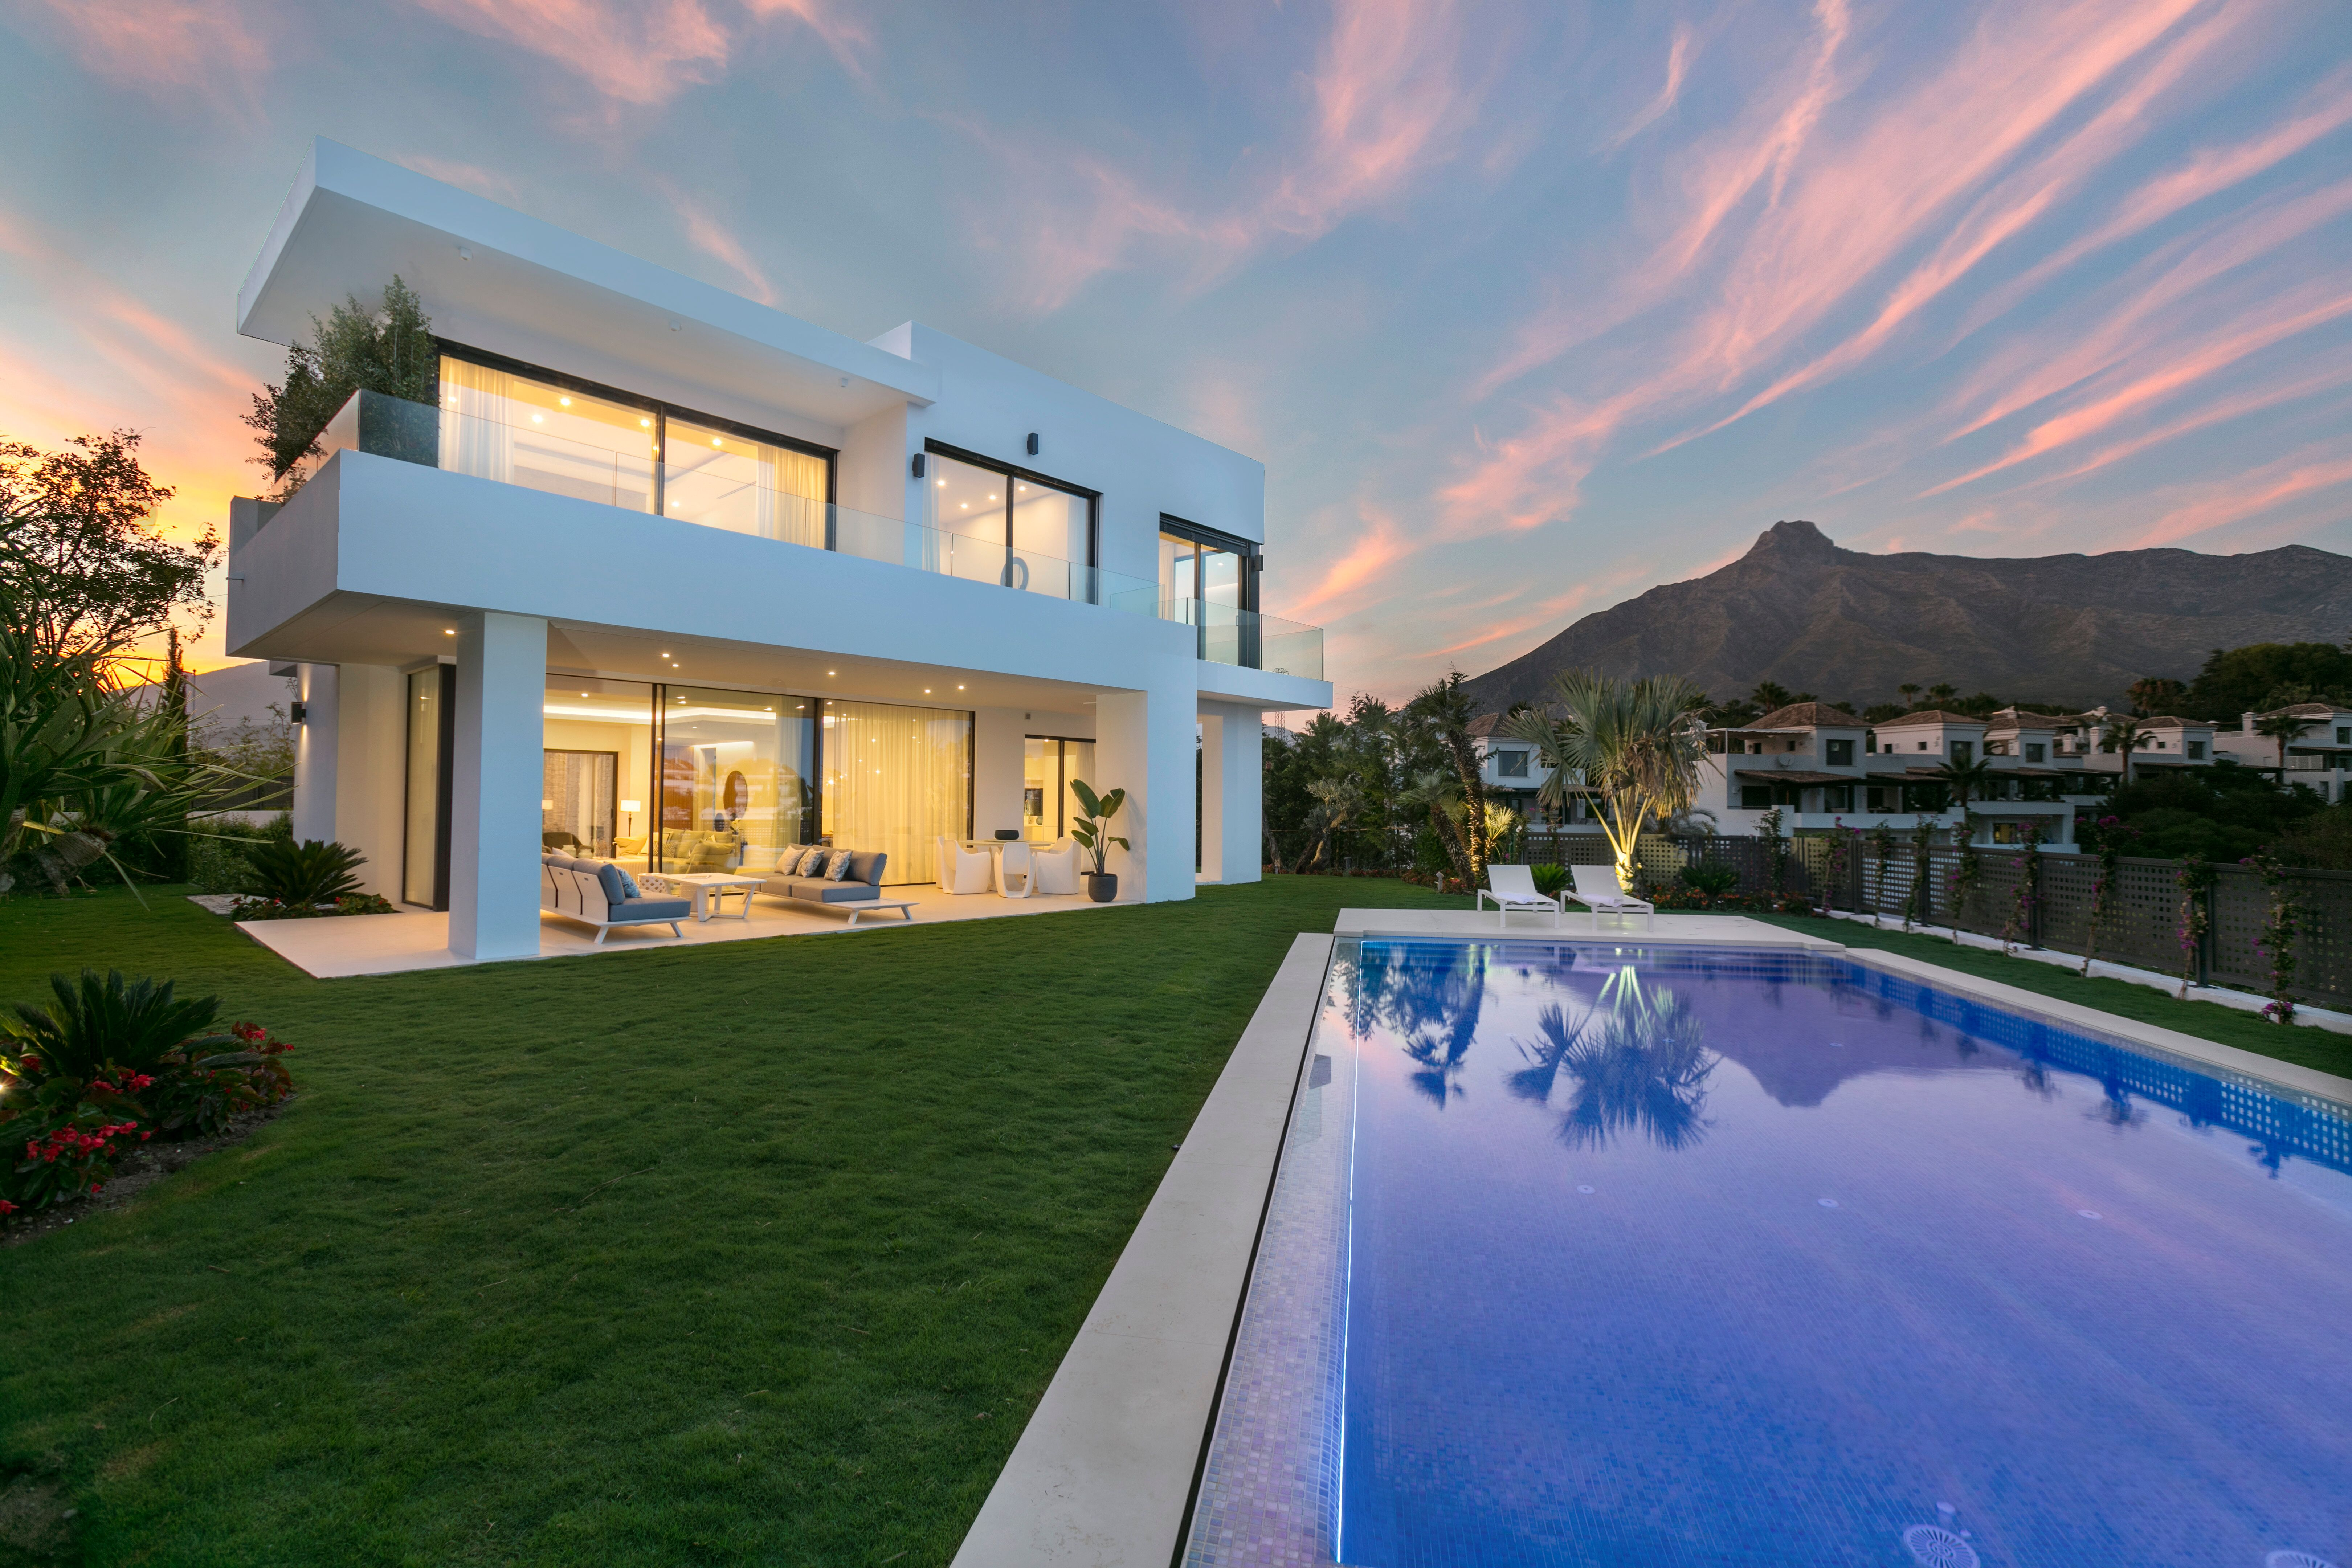 LUX0226: Villa in Marbella